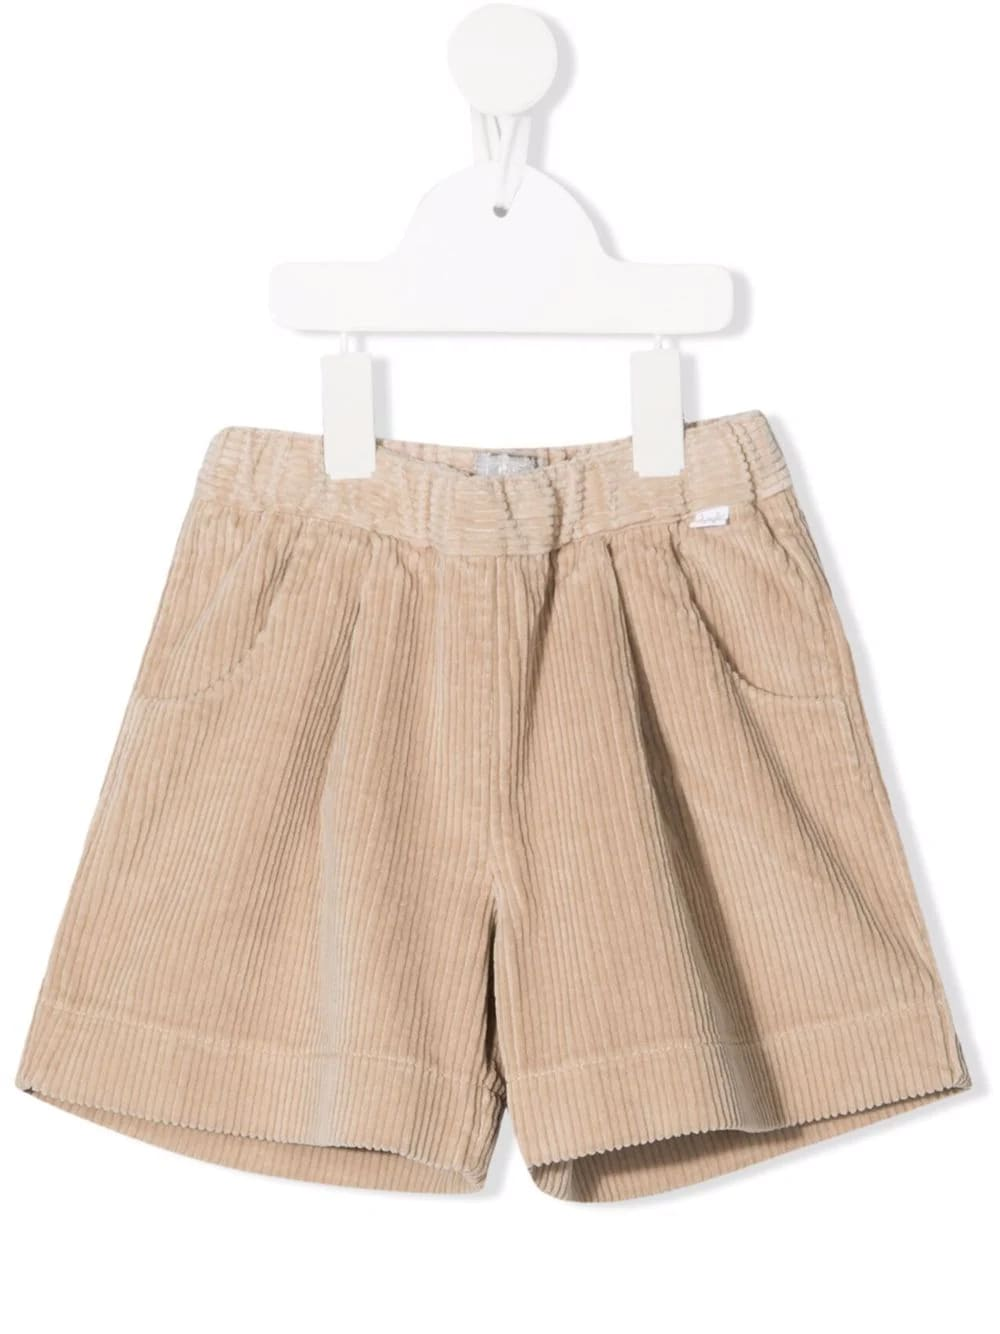 Kids Shorts In Beige Corduroy